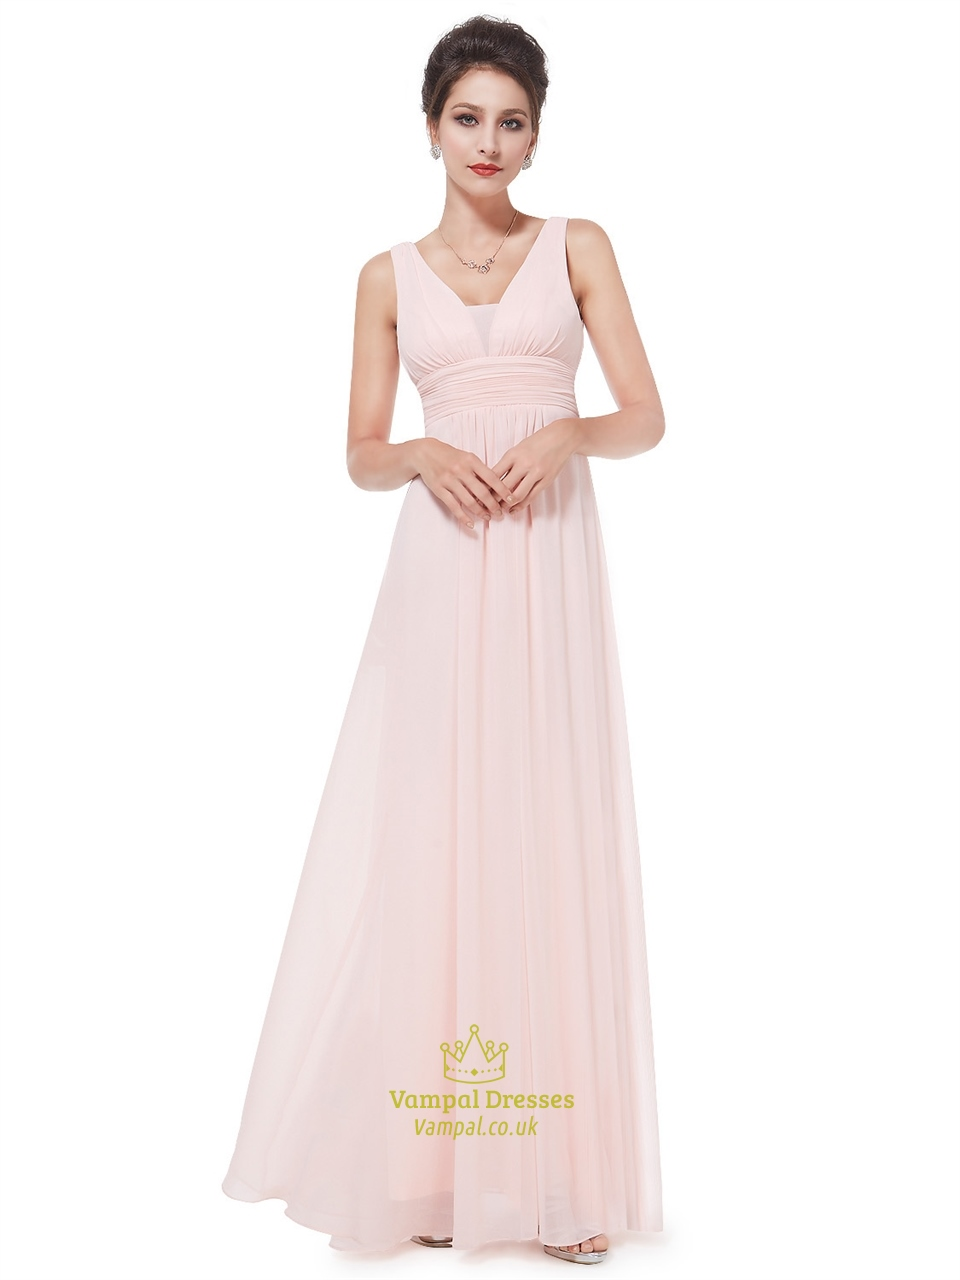 Peach v neck chiffon long bridesmaid dresses for beach for Chiffon wedding dresses for beach wedding